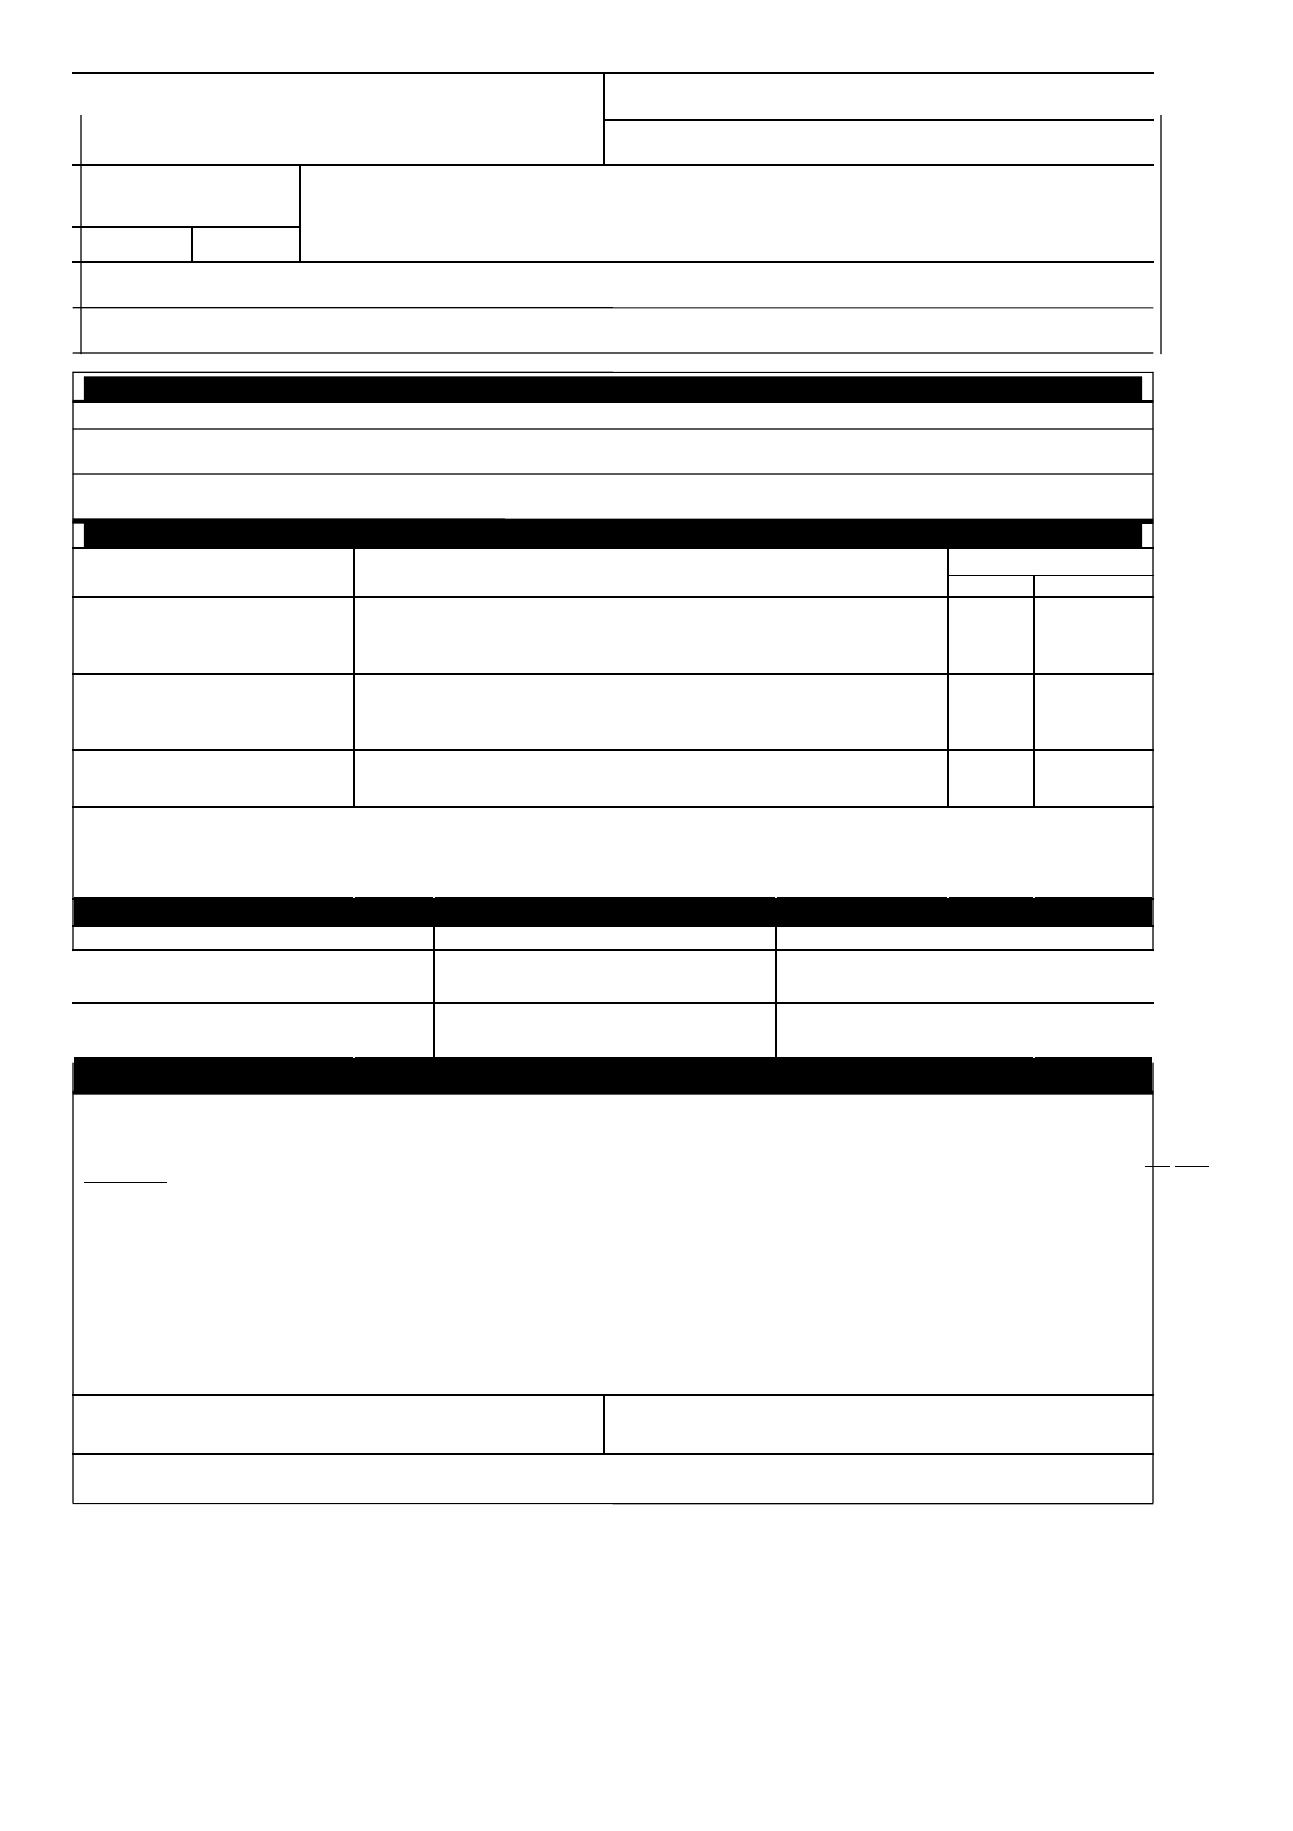 Free Printable Panera Bread Job Application Form Page 2